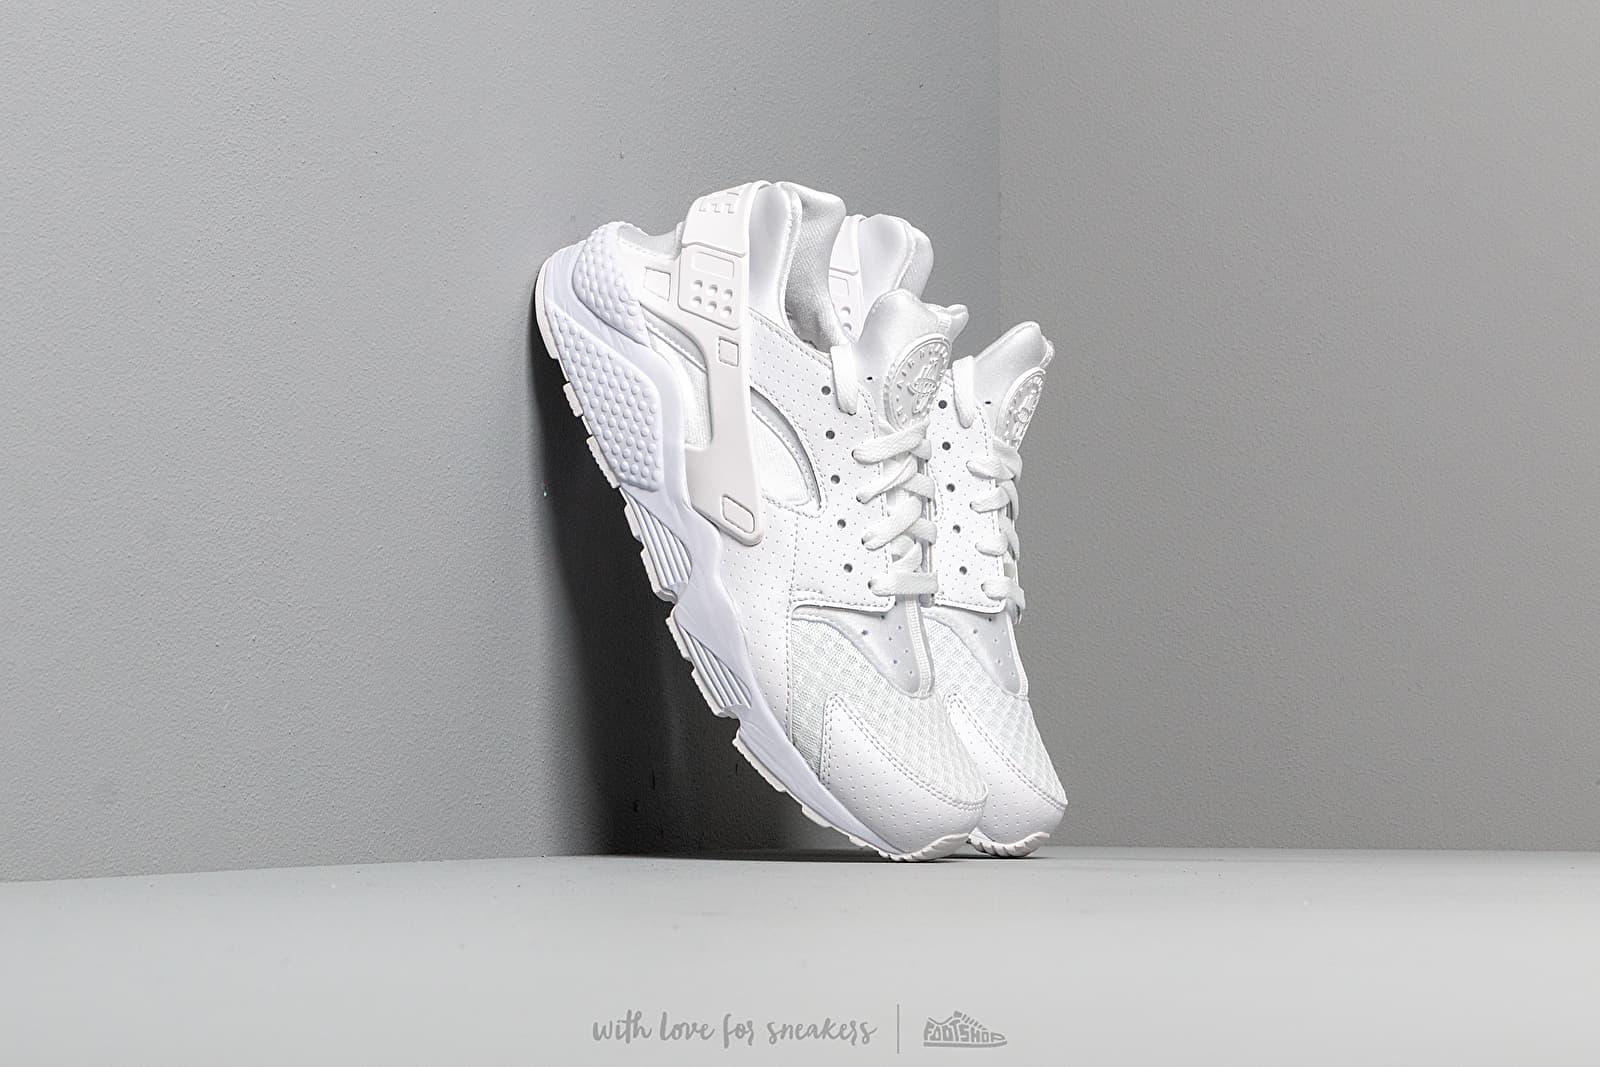 Nike Air Huarache White/ White-Pure Platinum za skvělou cenu 3 290 Kč koupíte na Footshop.cz